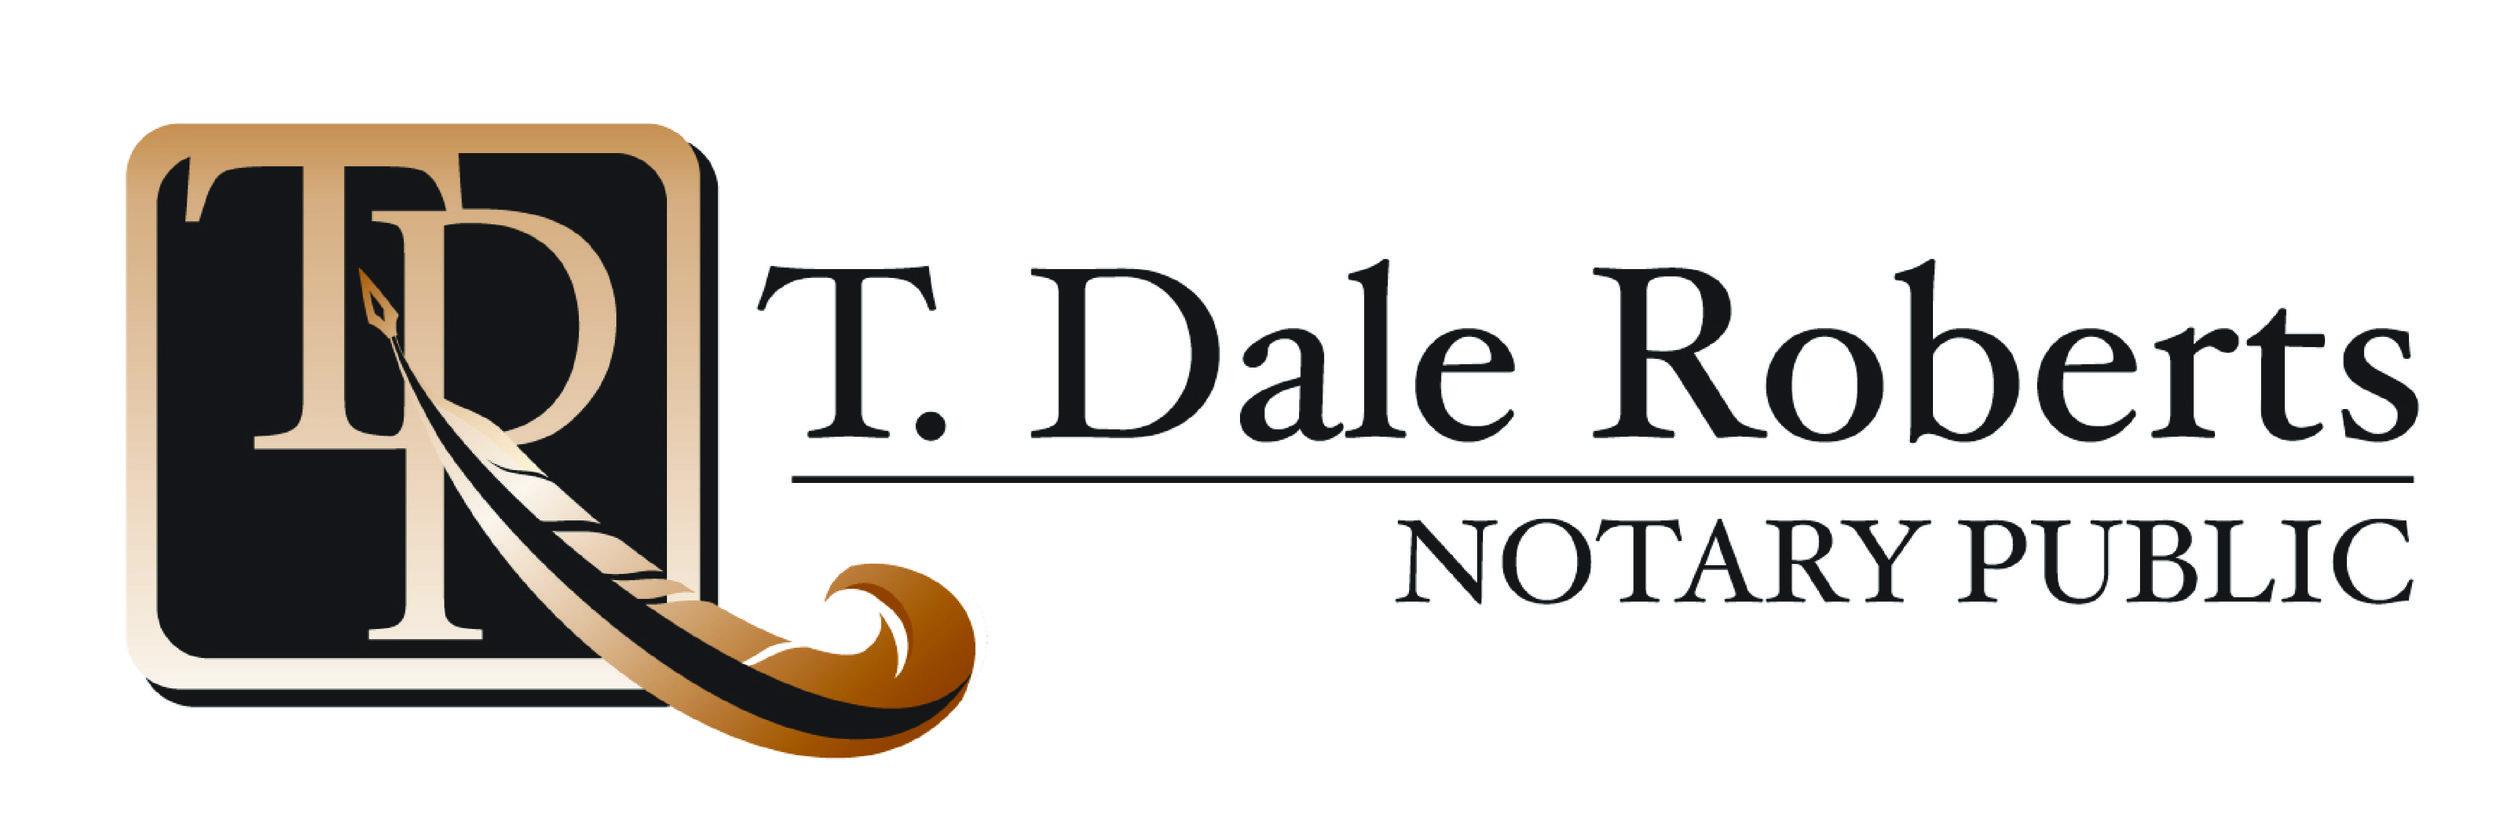 Dale Roberts.jpg